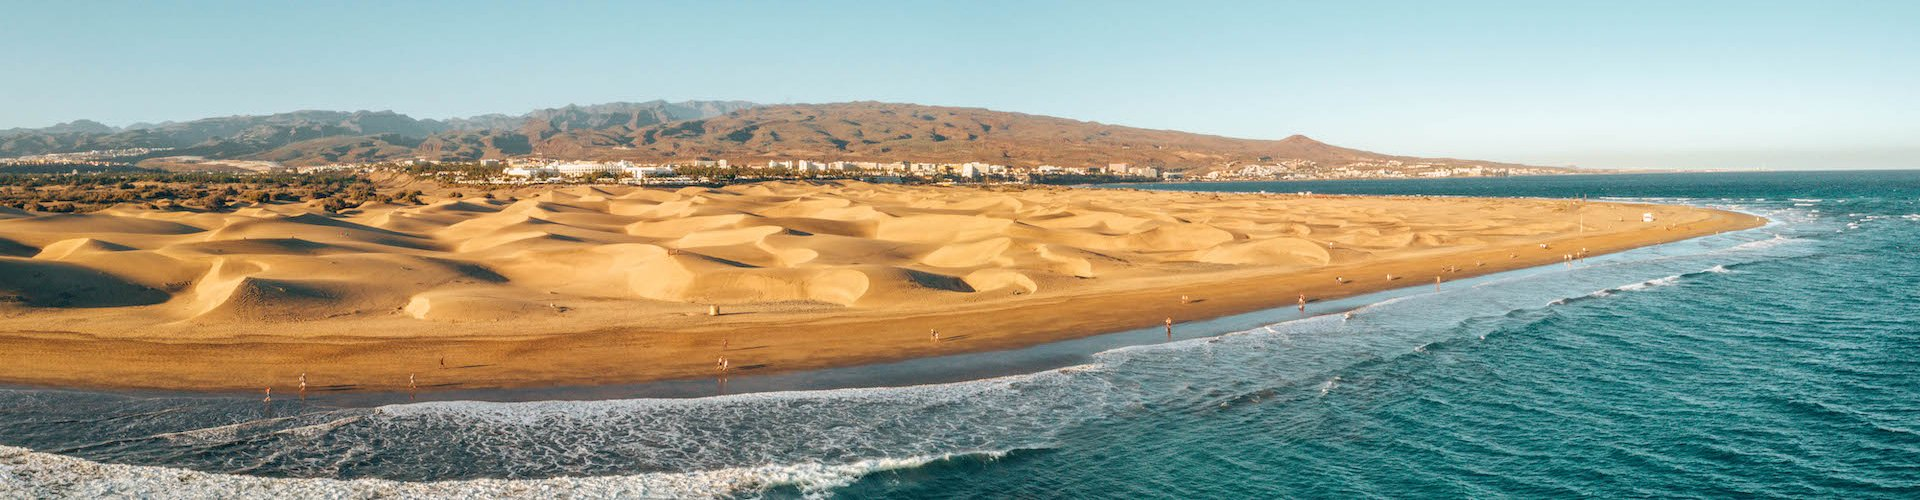 Familienurlaub in Maspalomas und in Playa del Ingles